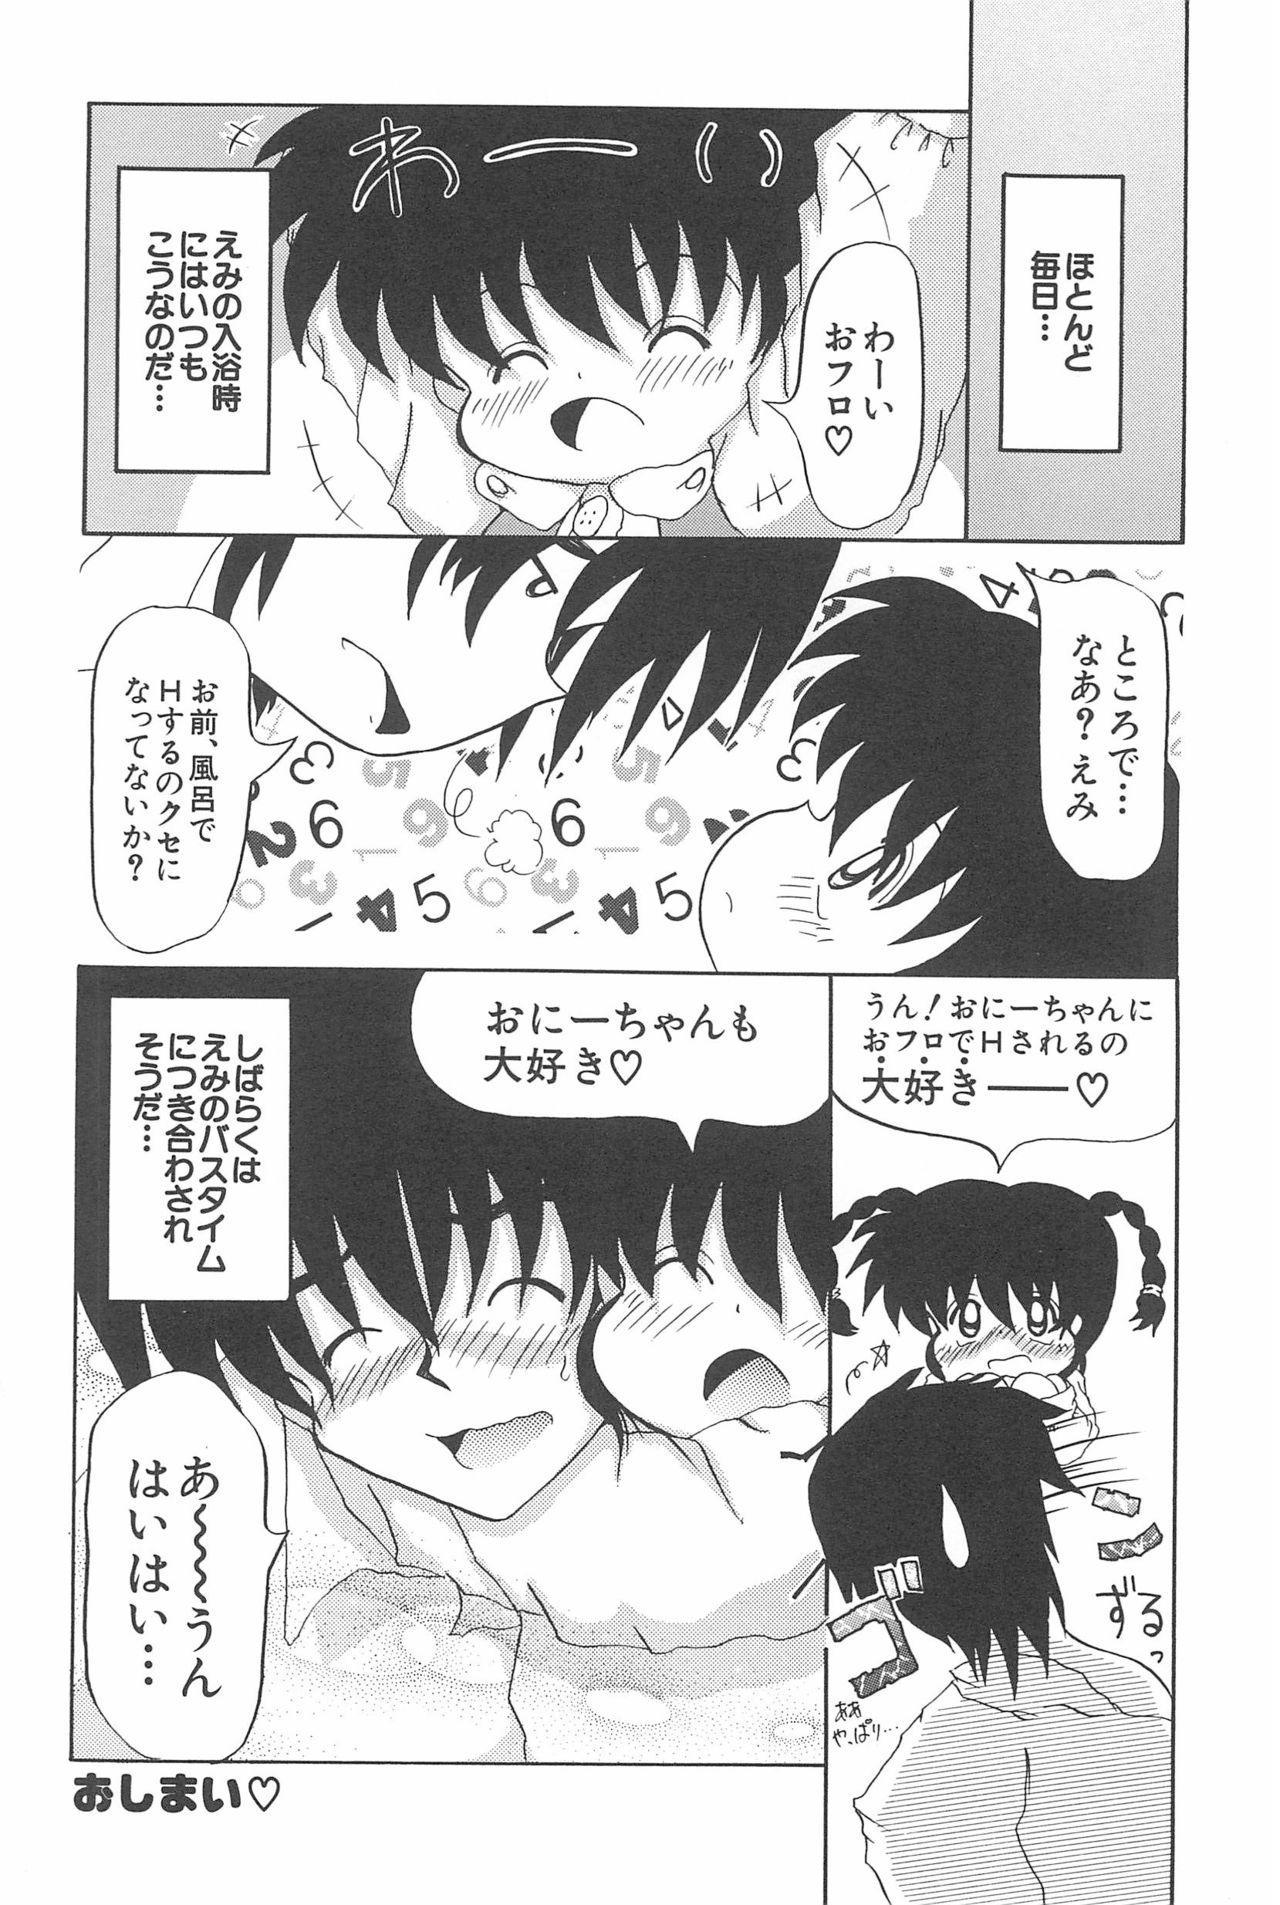 Aoi Shojokyuu 125